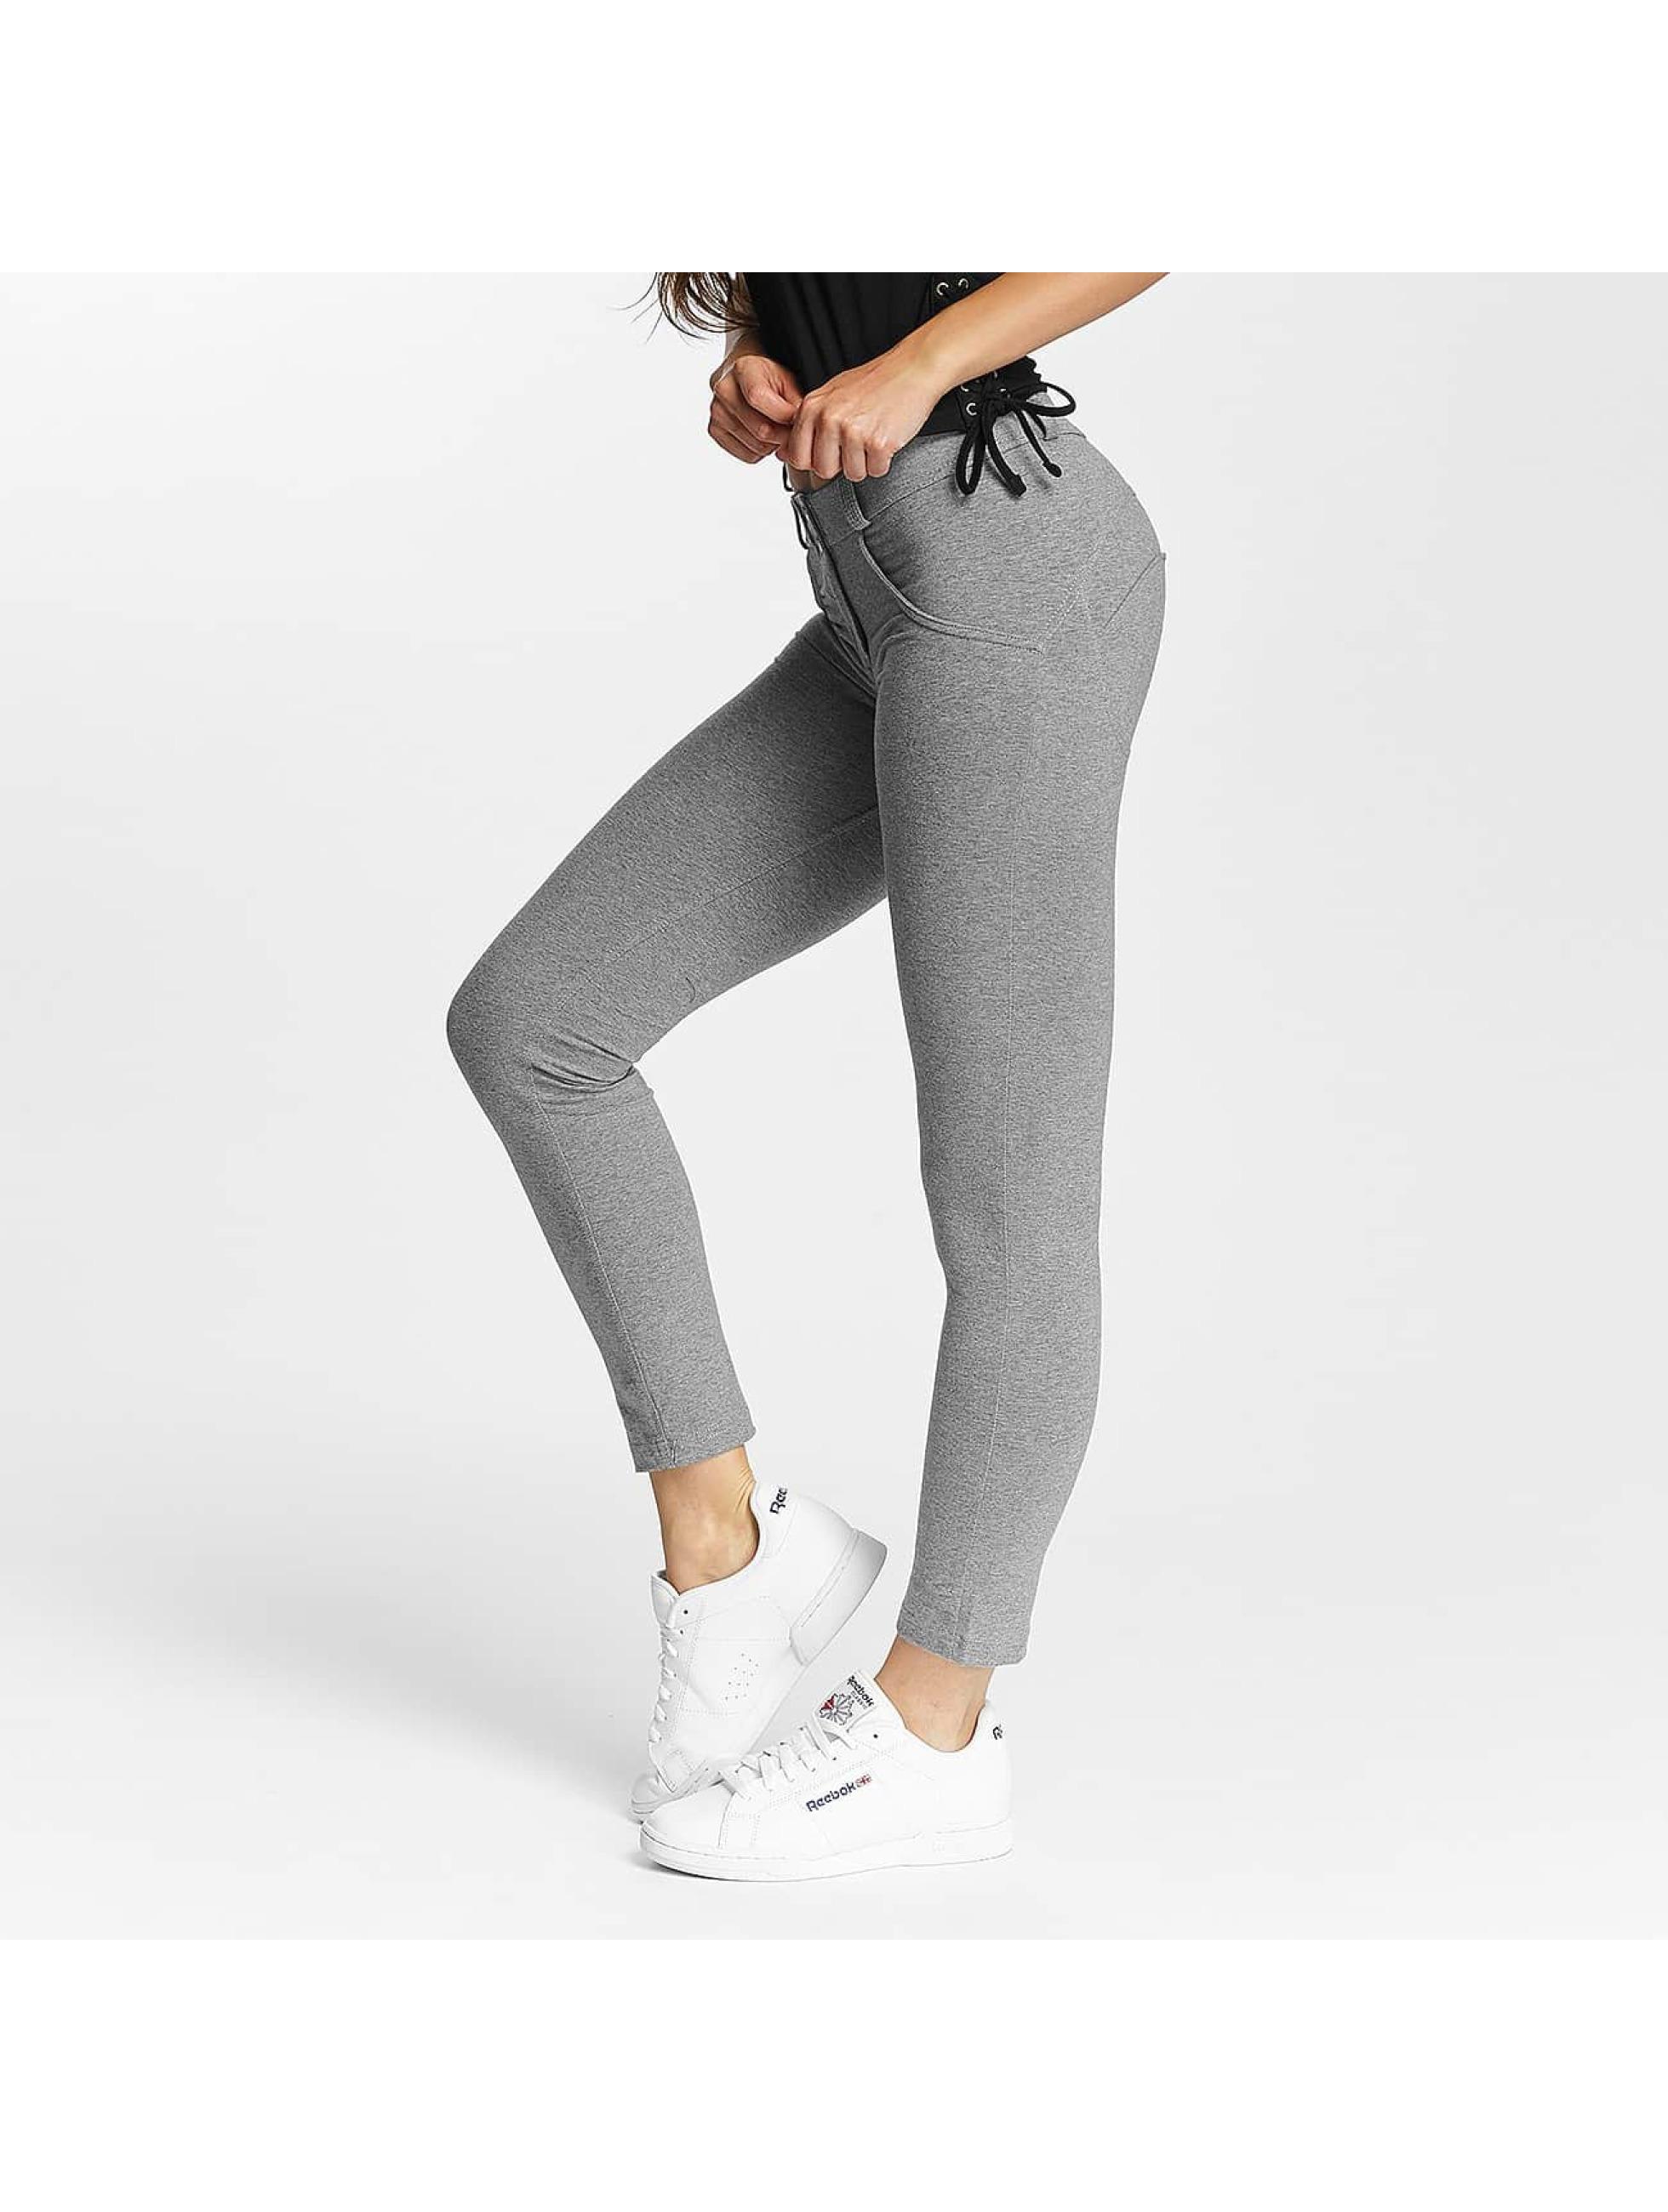 Freddy Skinny jeans 7/8 Regular grijs